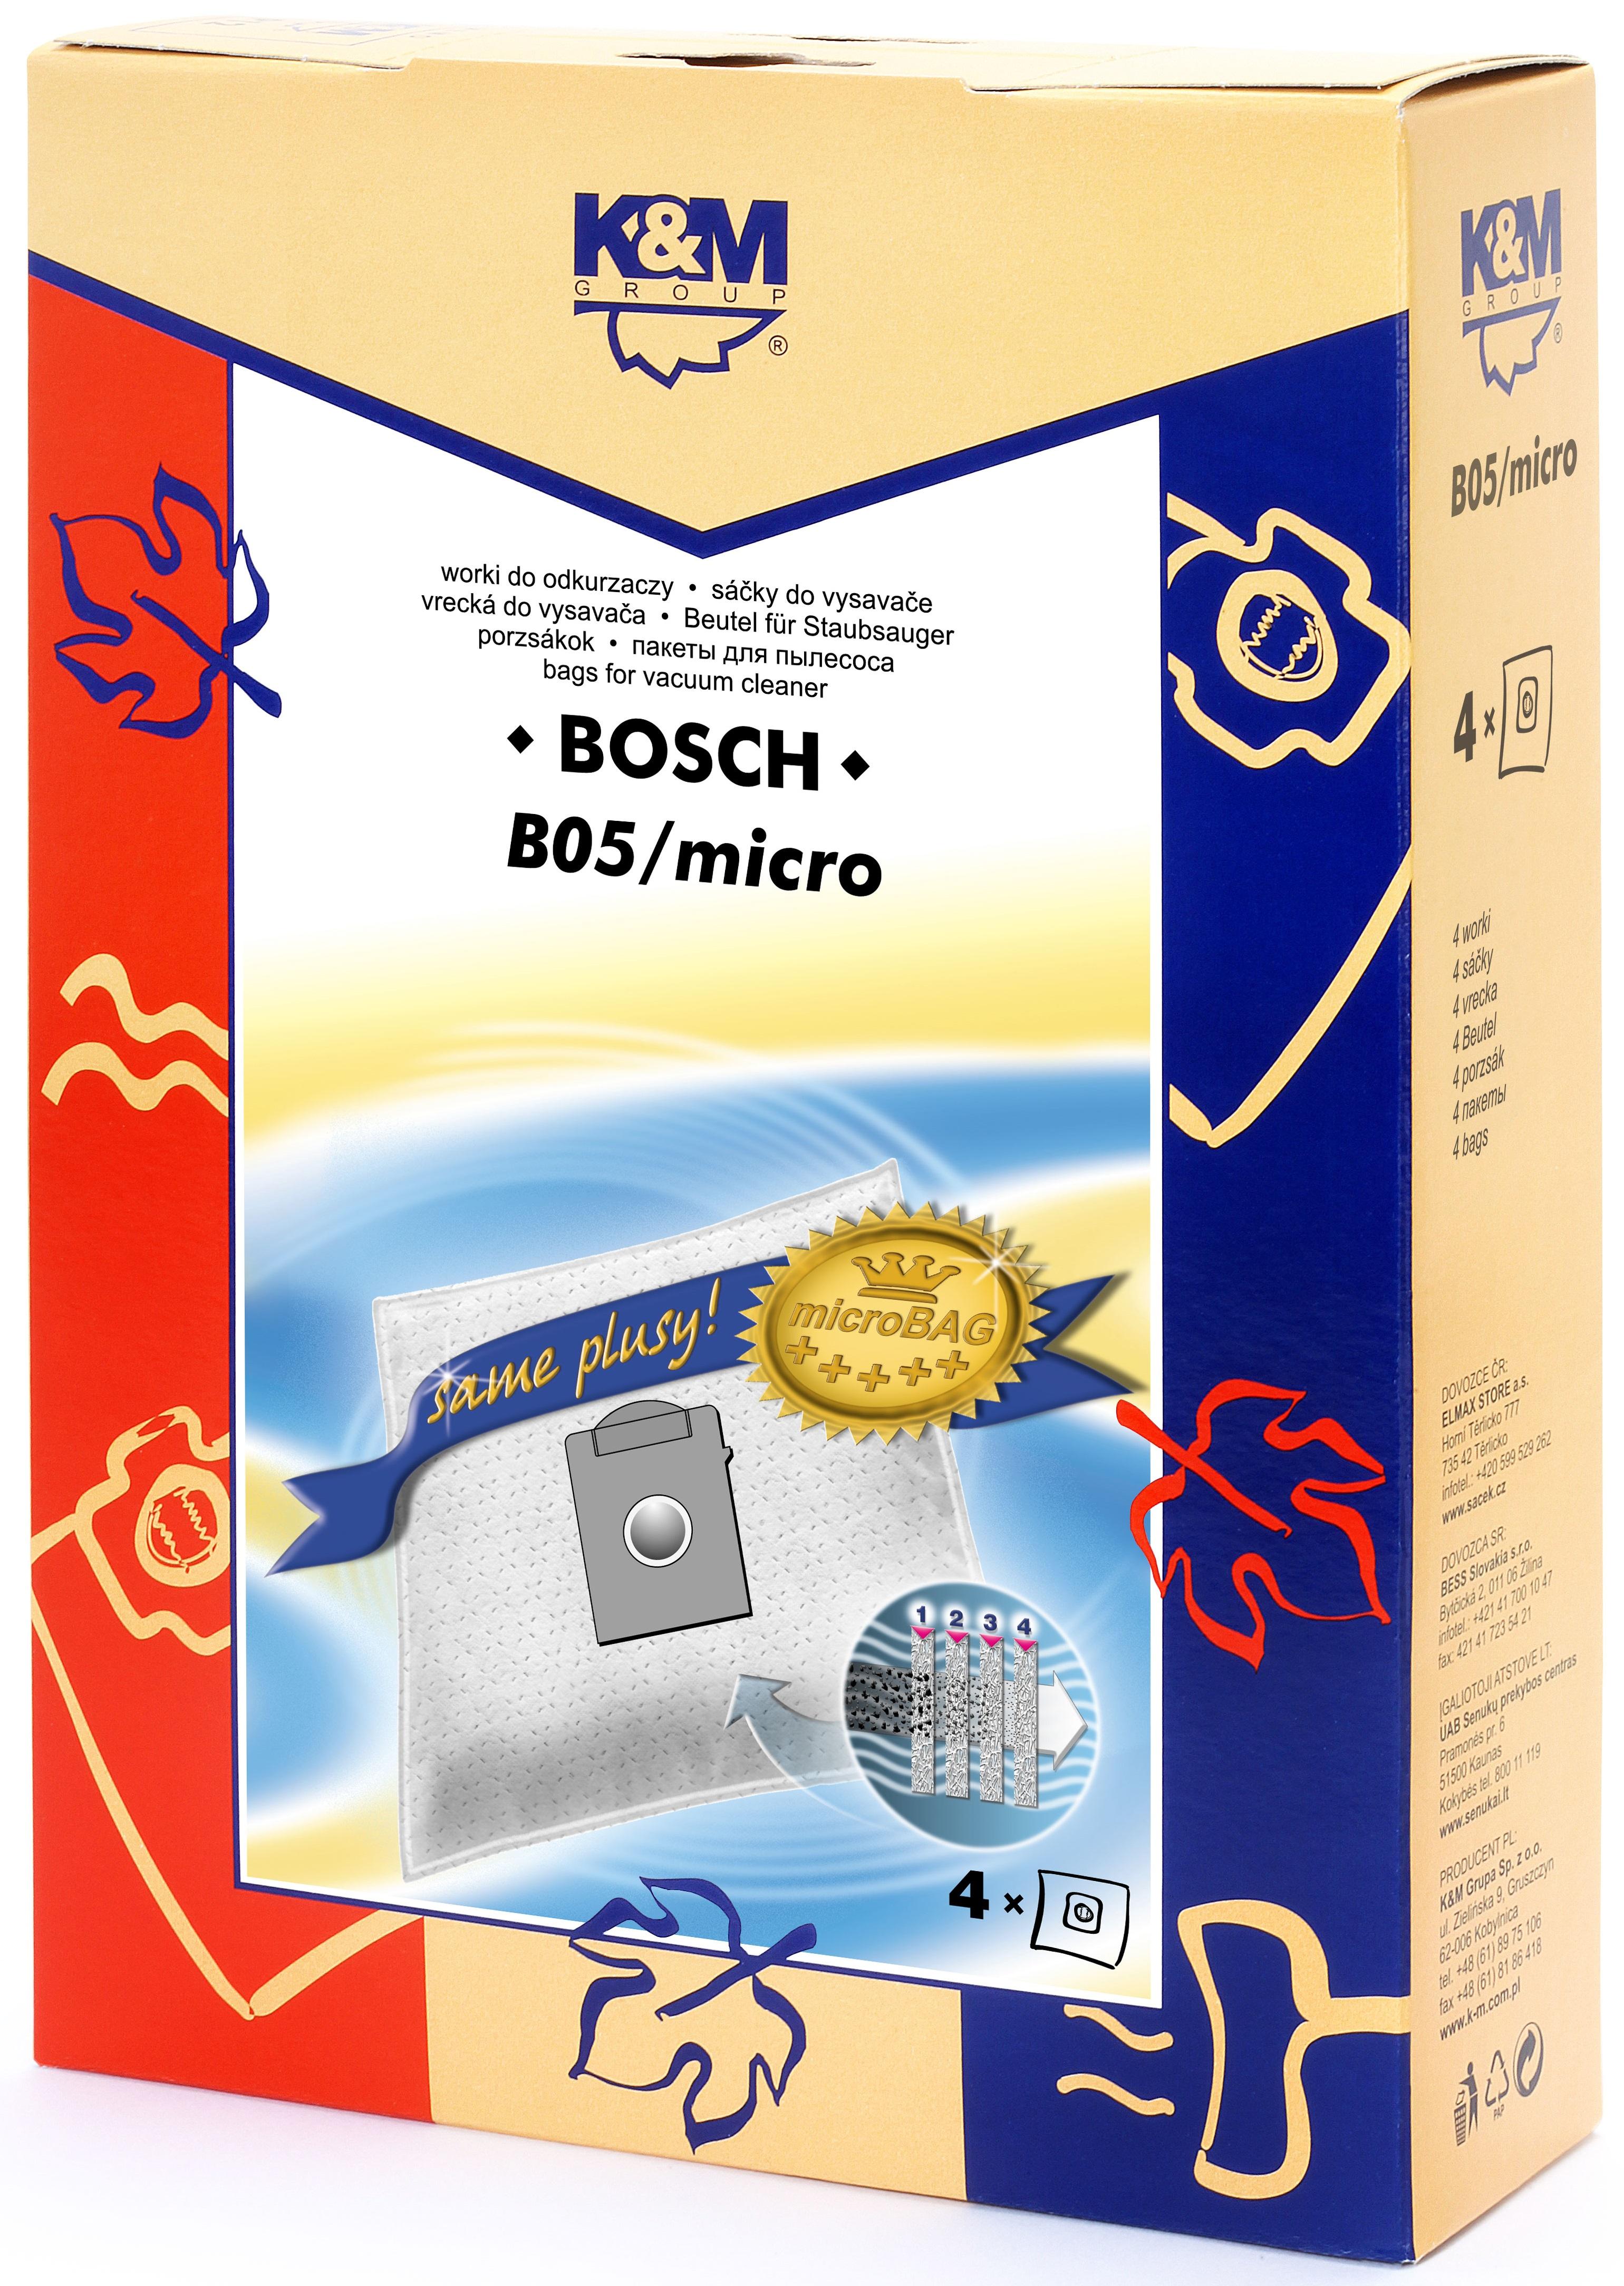 Sac aspirator pentru Bosch/Siemens typ K, sintetic, 4 X saci, K&M 0